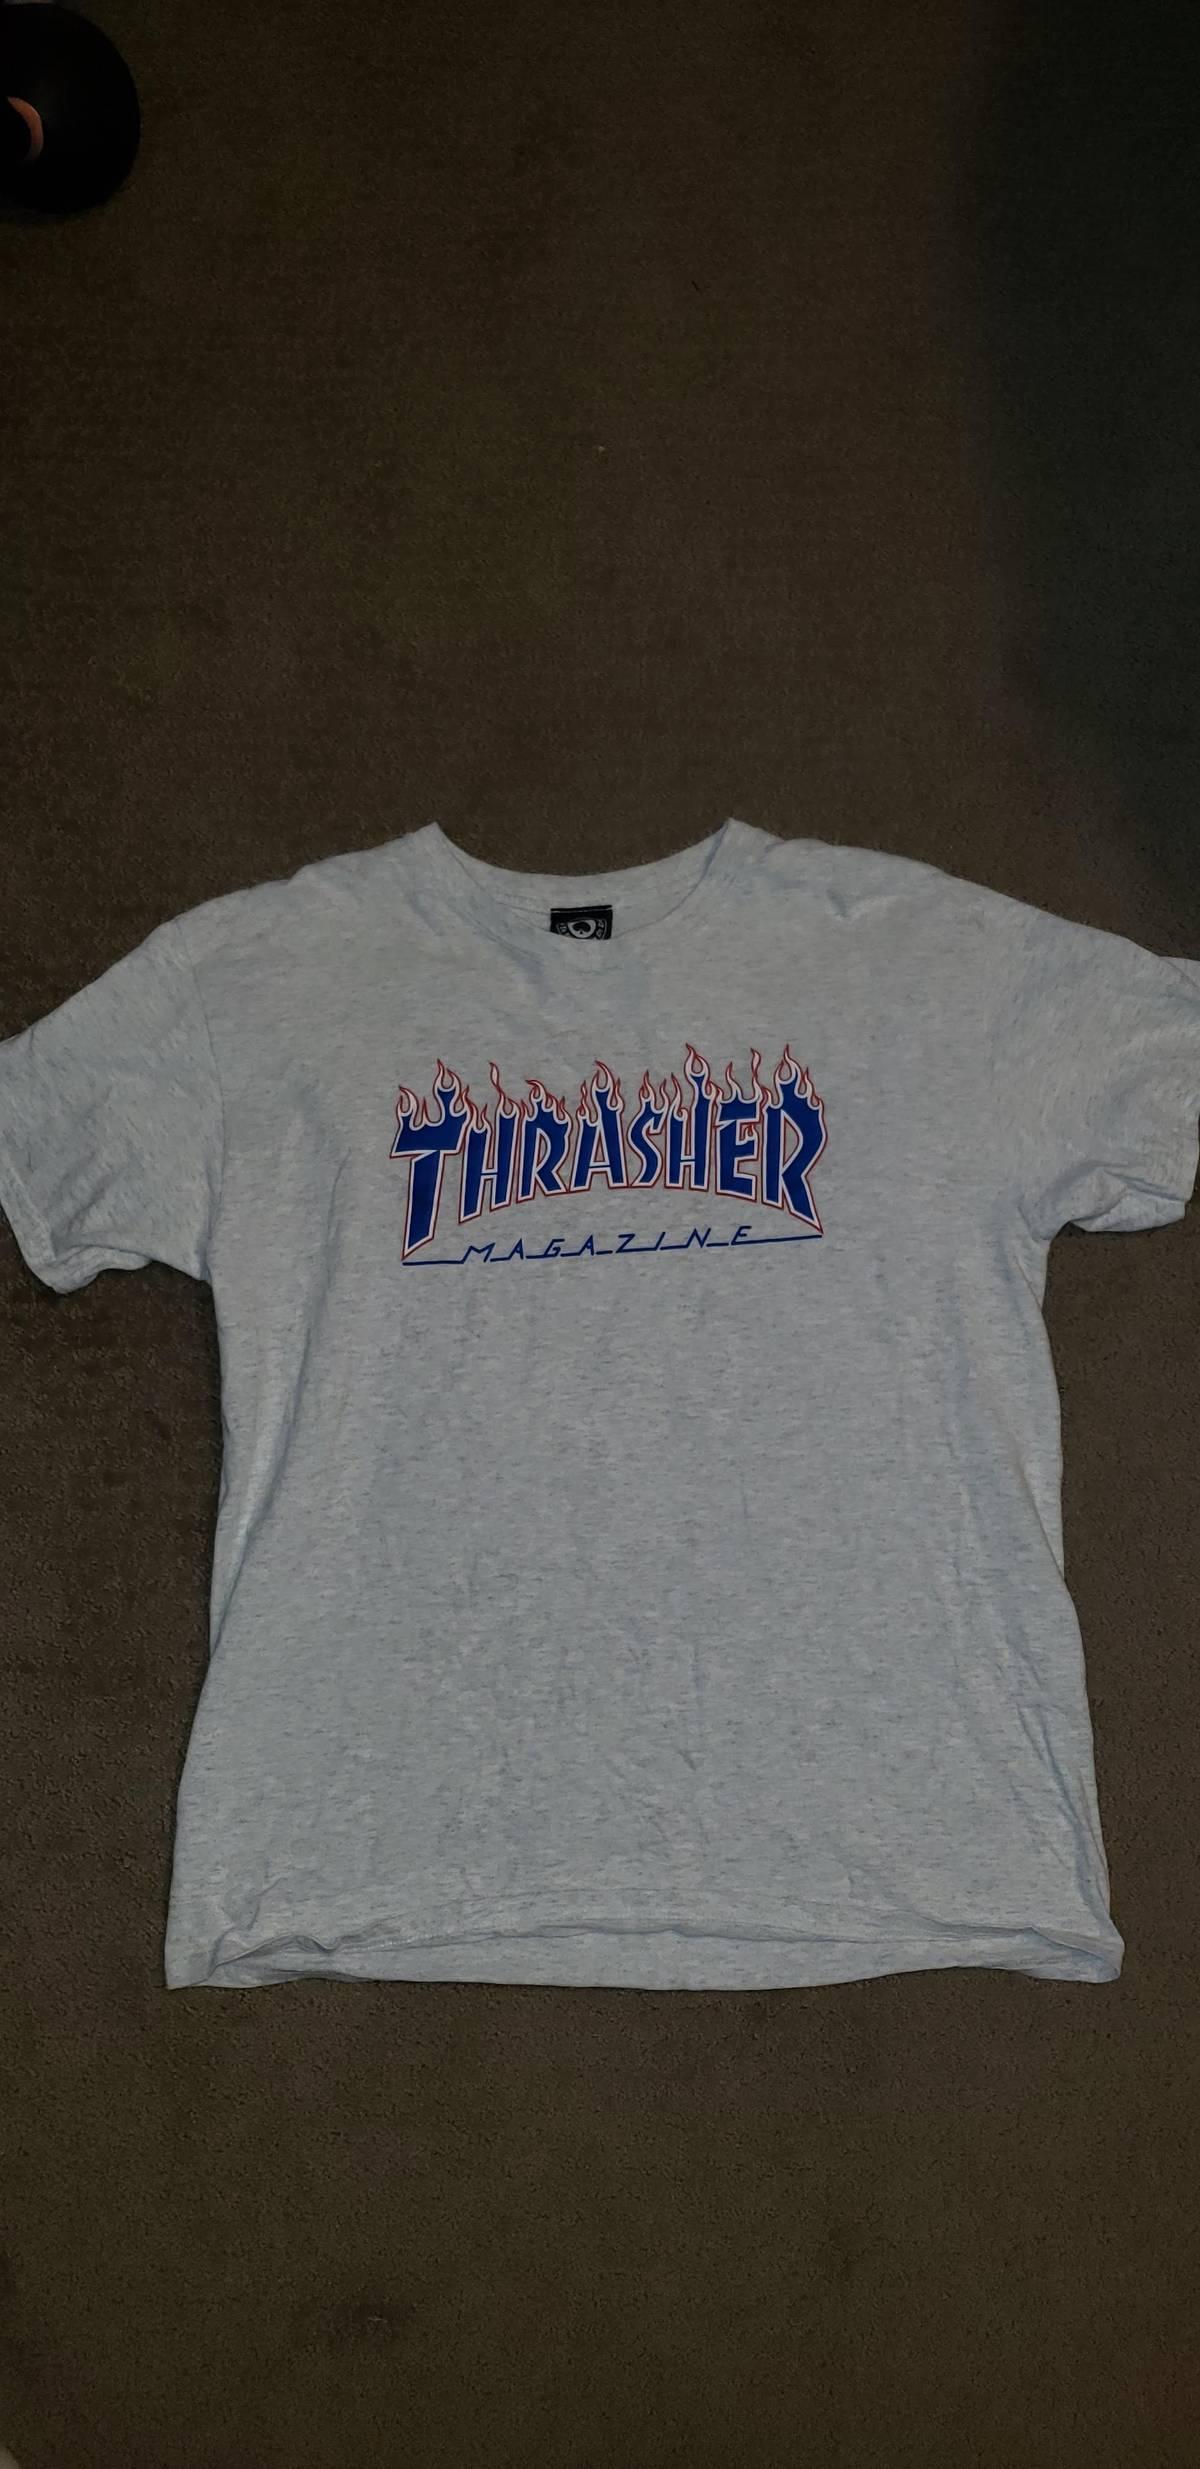 7b9ff72ac Thrasher Patriot Flame Ash Grey/white T-shirt | Grailed